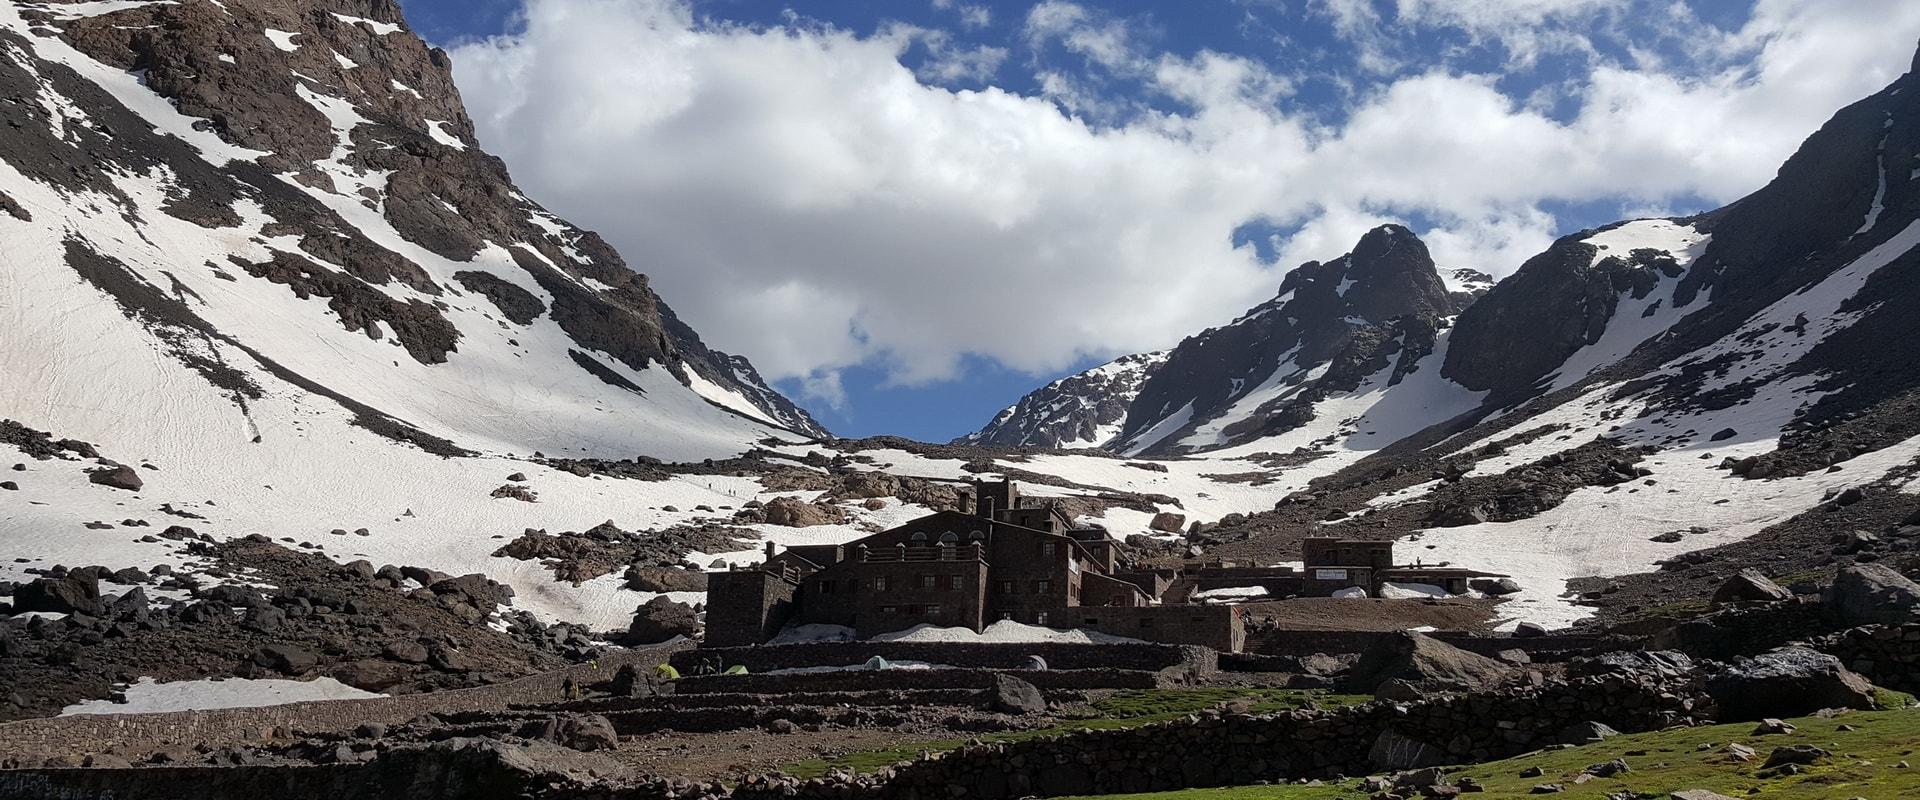 Voyages Expeditions Maroc - weekend au massif du toubkal